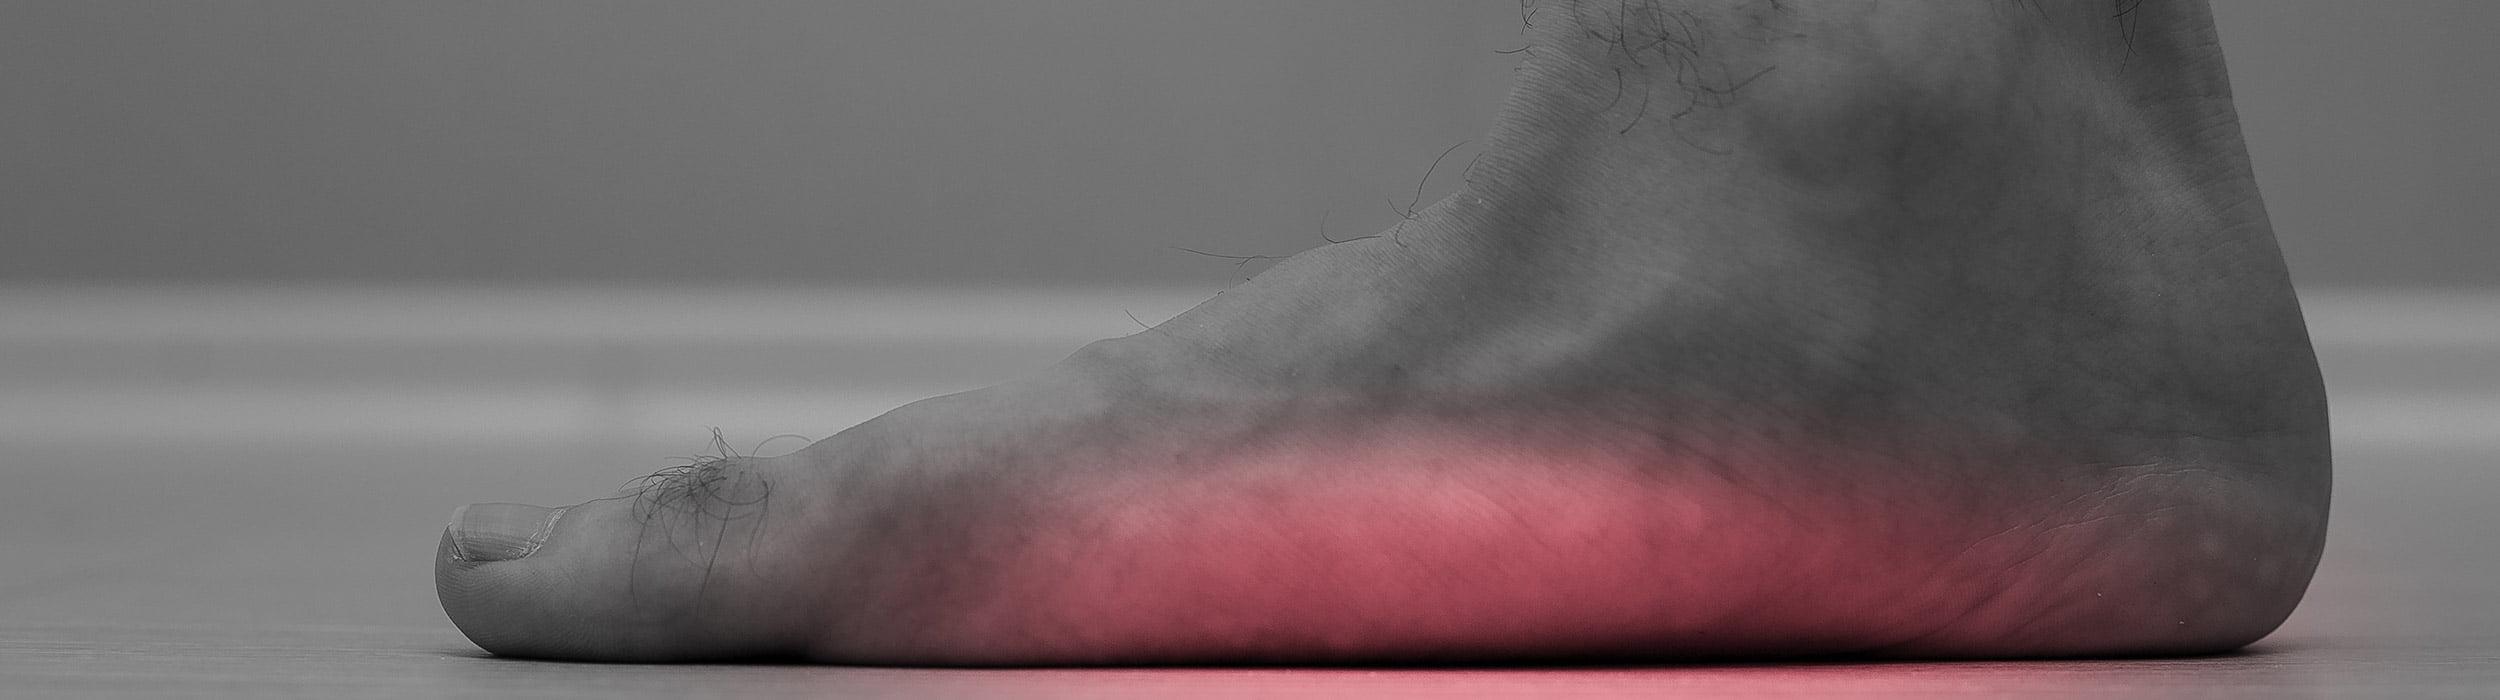 picior plat kinetoterapie chiromedica health center desktop